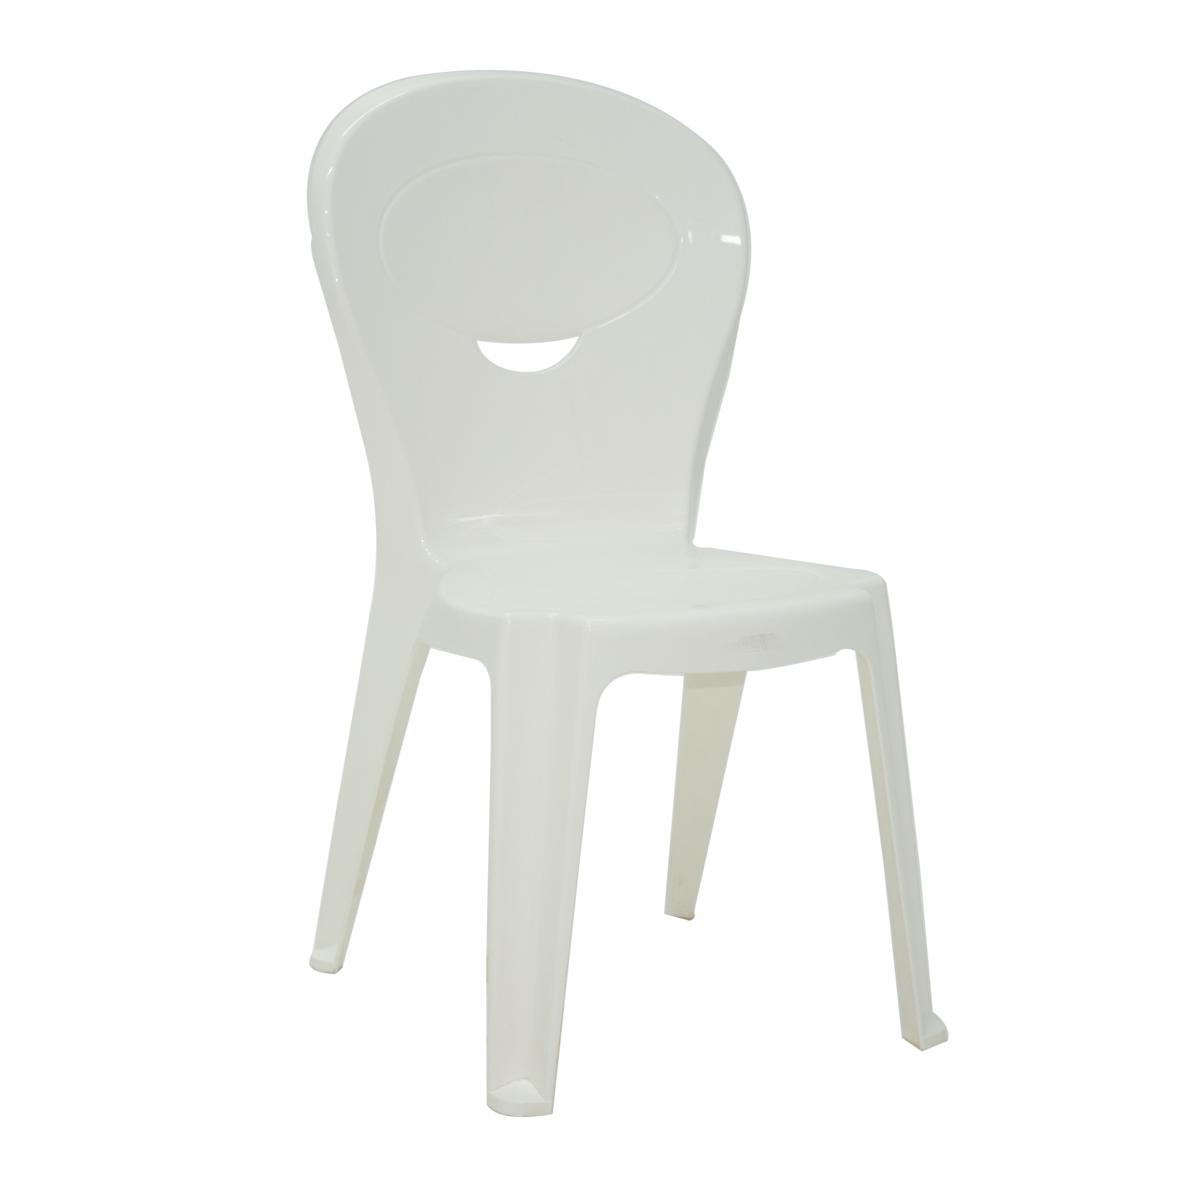 Cadeira Infantil de Plastico Vice Branca 92270010 - Tramontina